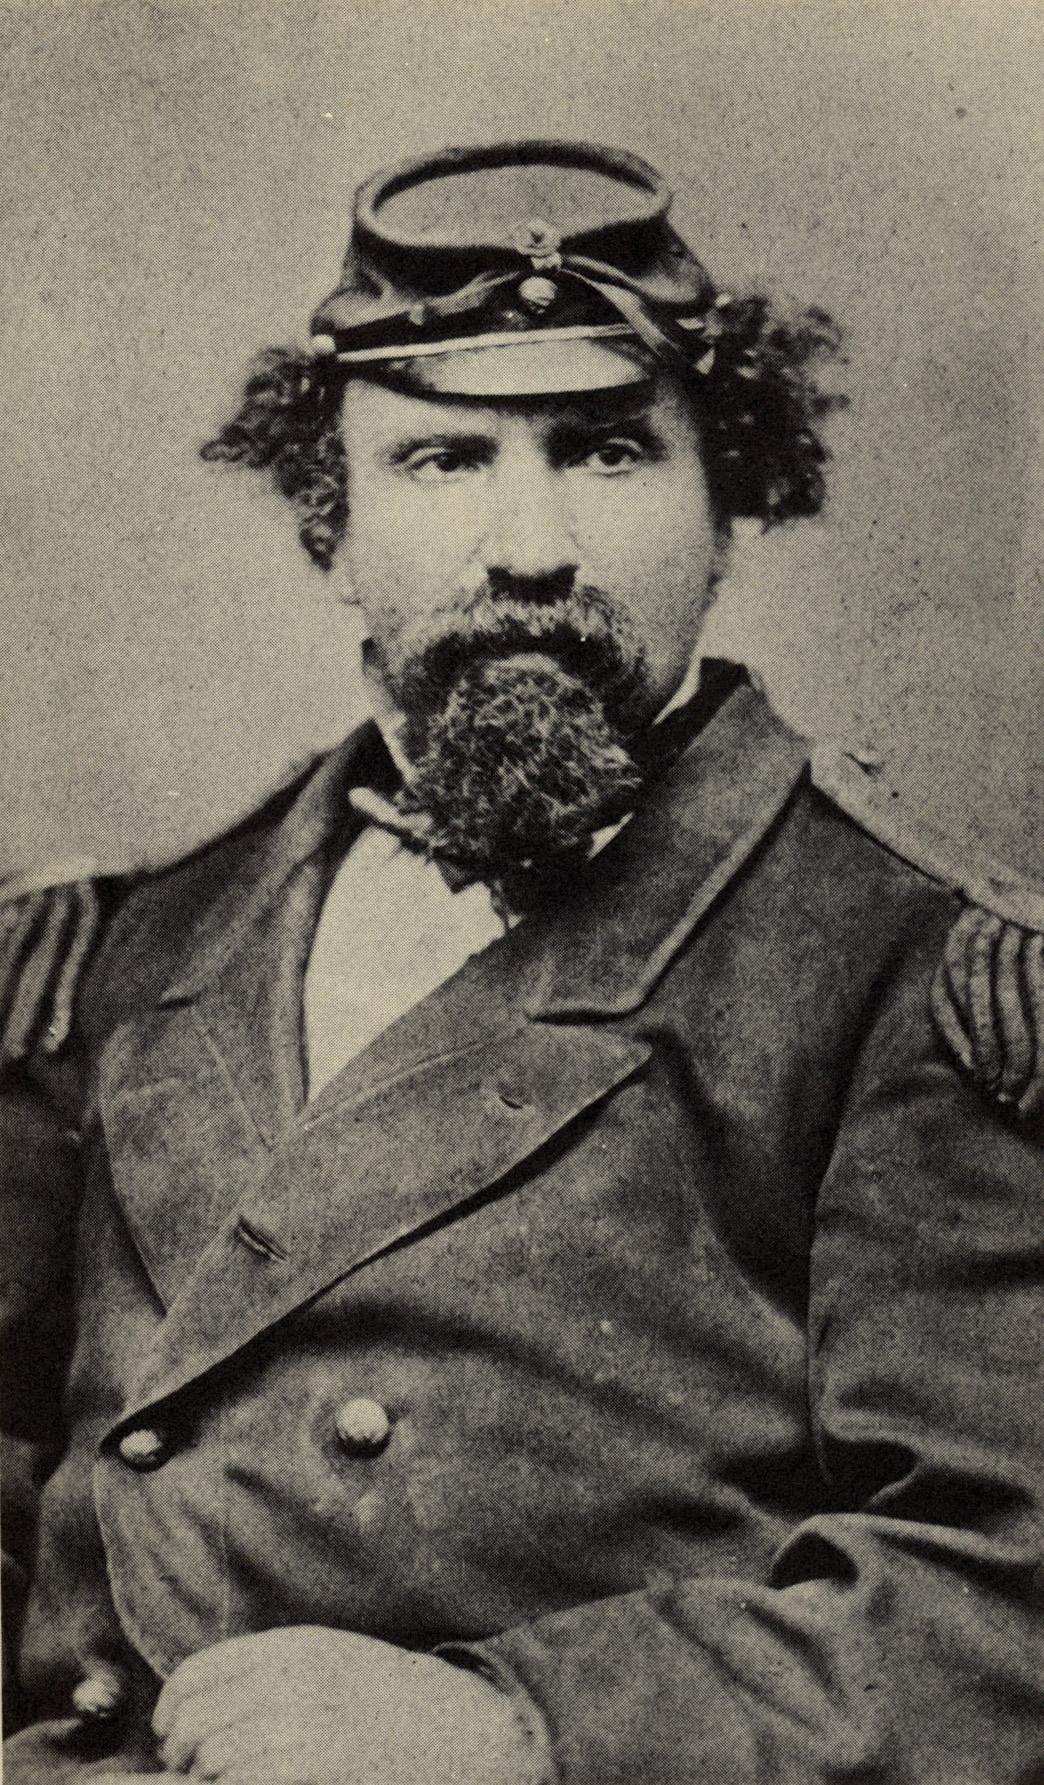 Emperor Norton, c.1871–72.  Photograph by Tuttle & Johnson, Heliographic Artists, 523 Kearny Street, San Francisco.